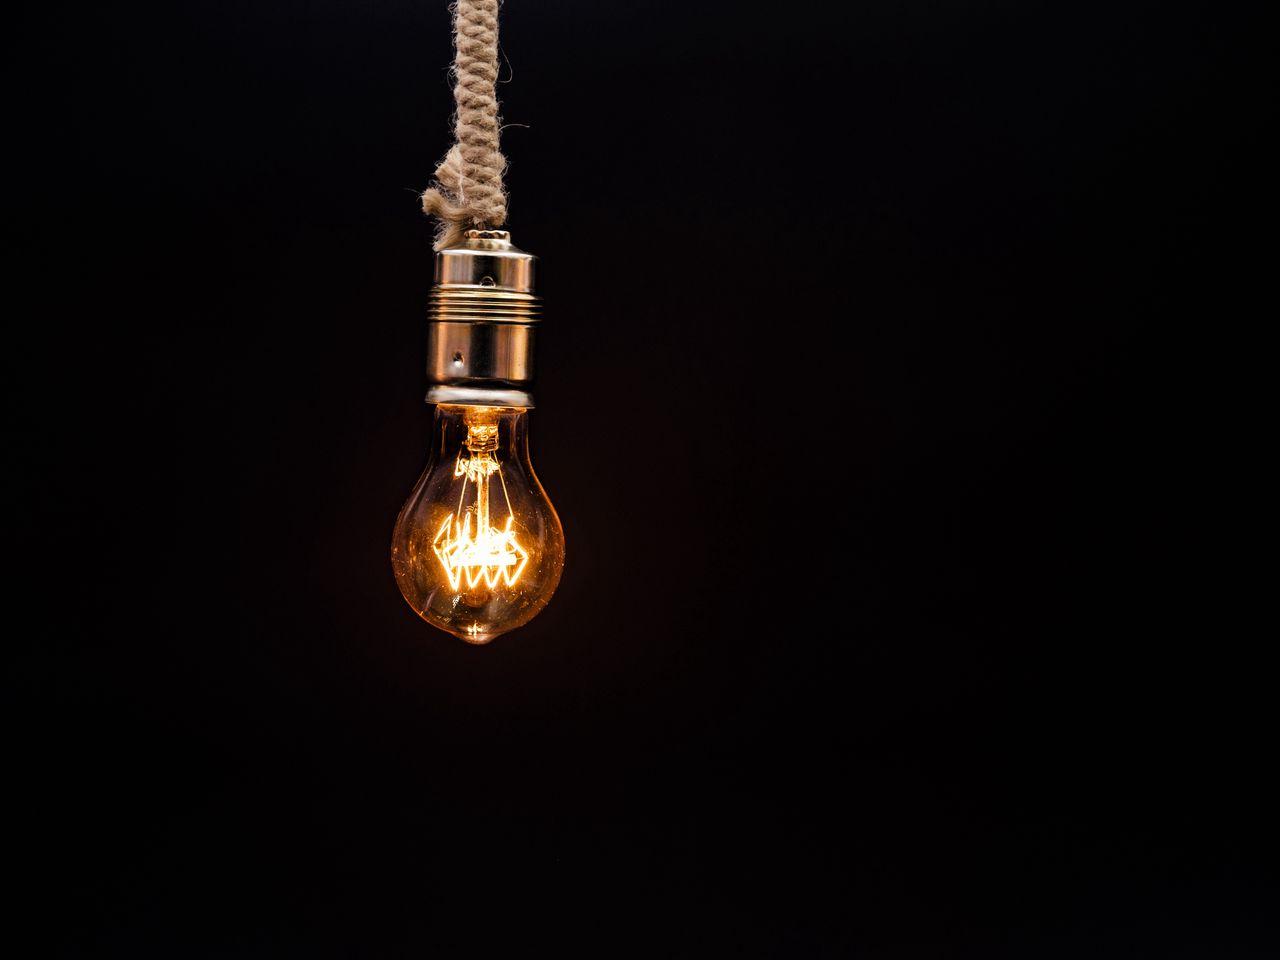 1280x960 Wallpaper bulb, lighting, rope, electricity, edisons lamp